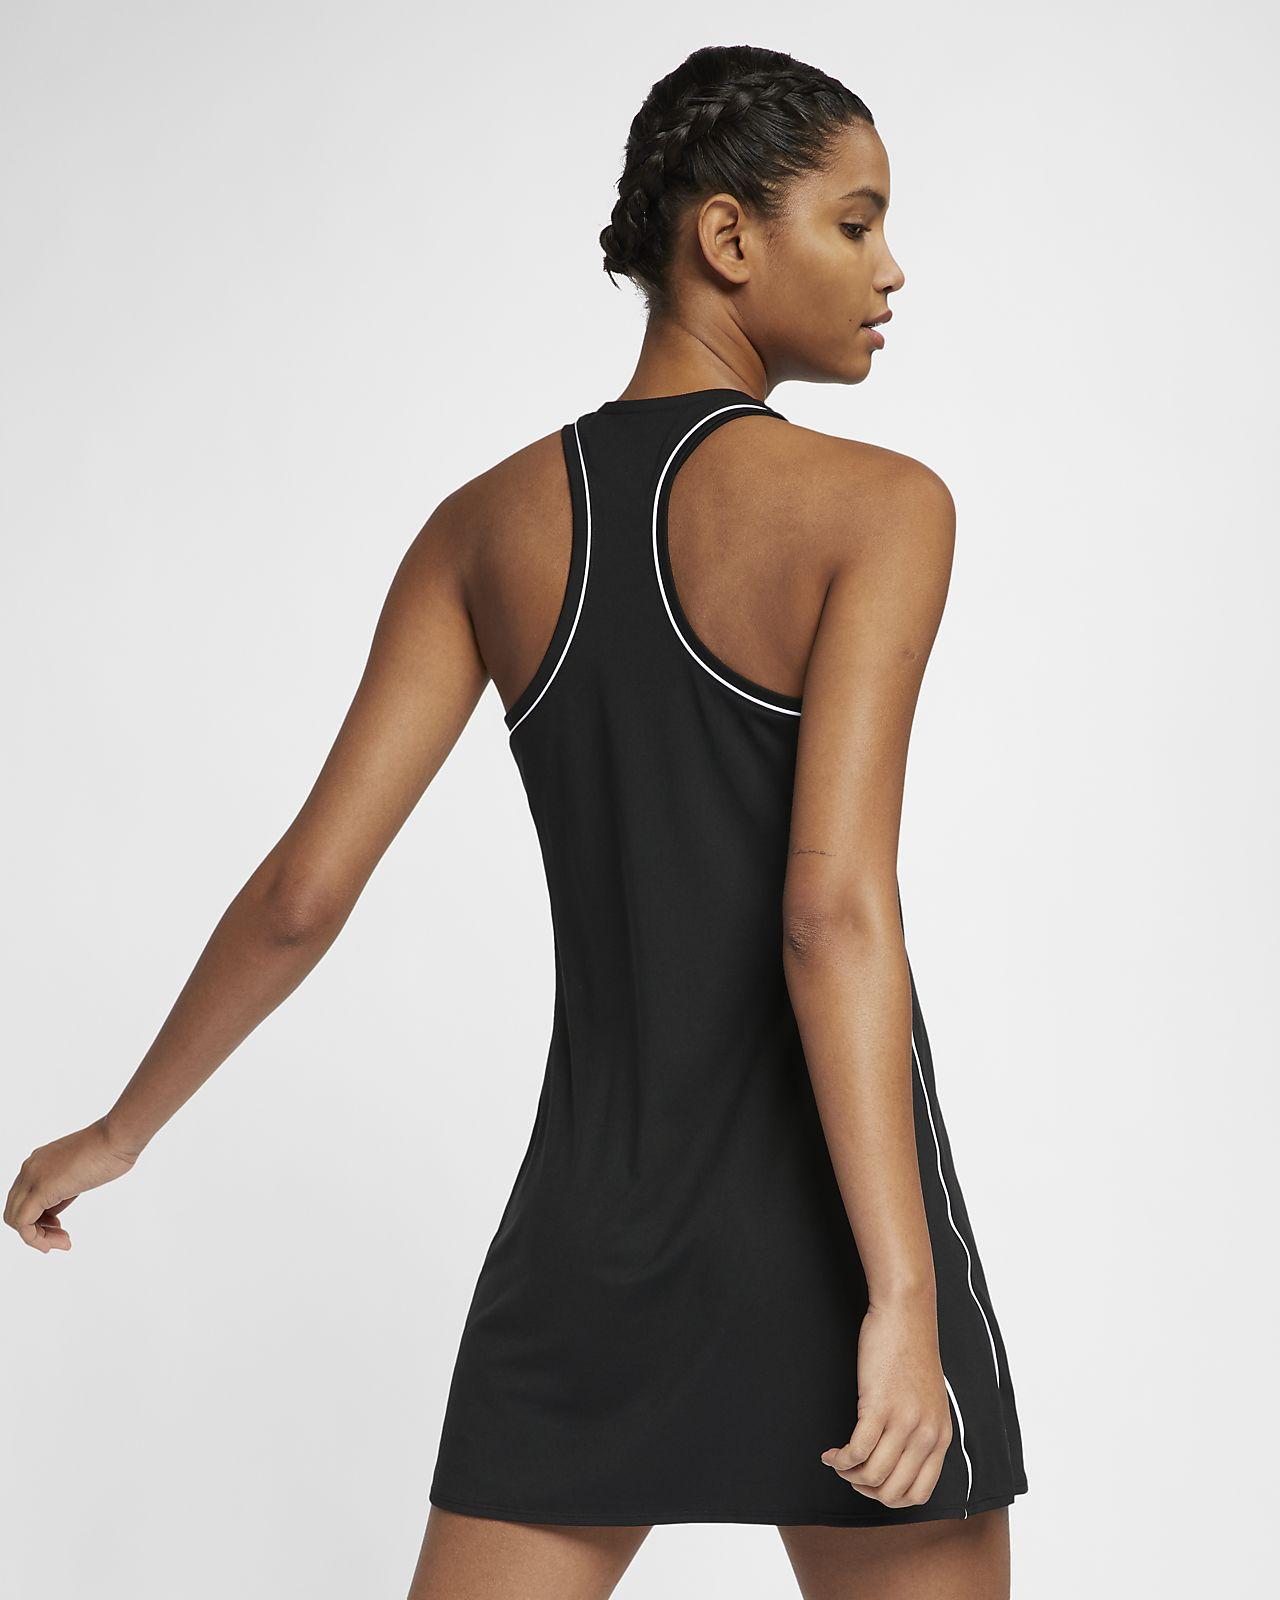 NikeCourt Dri FIT Women's Tennis Dress